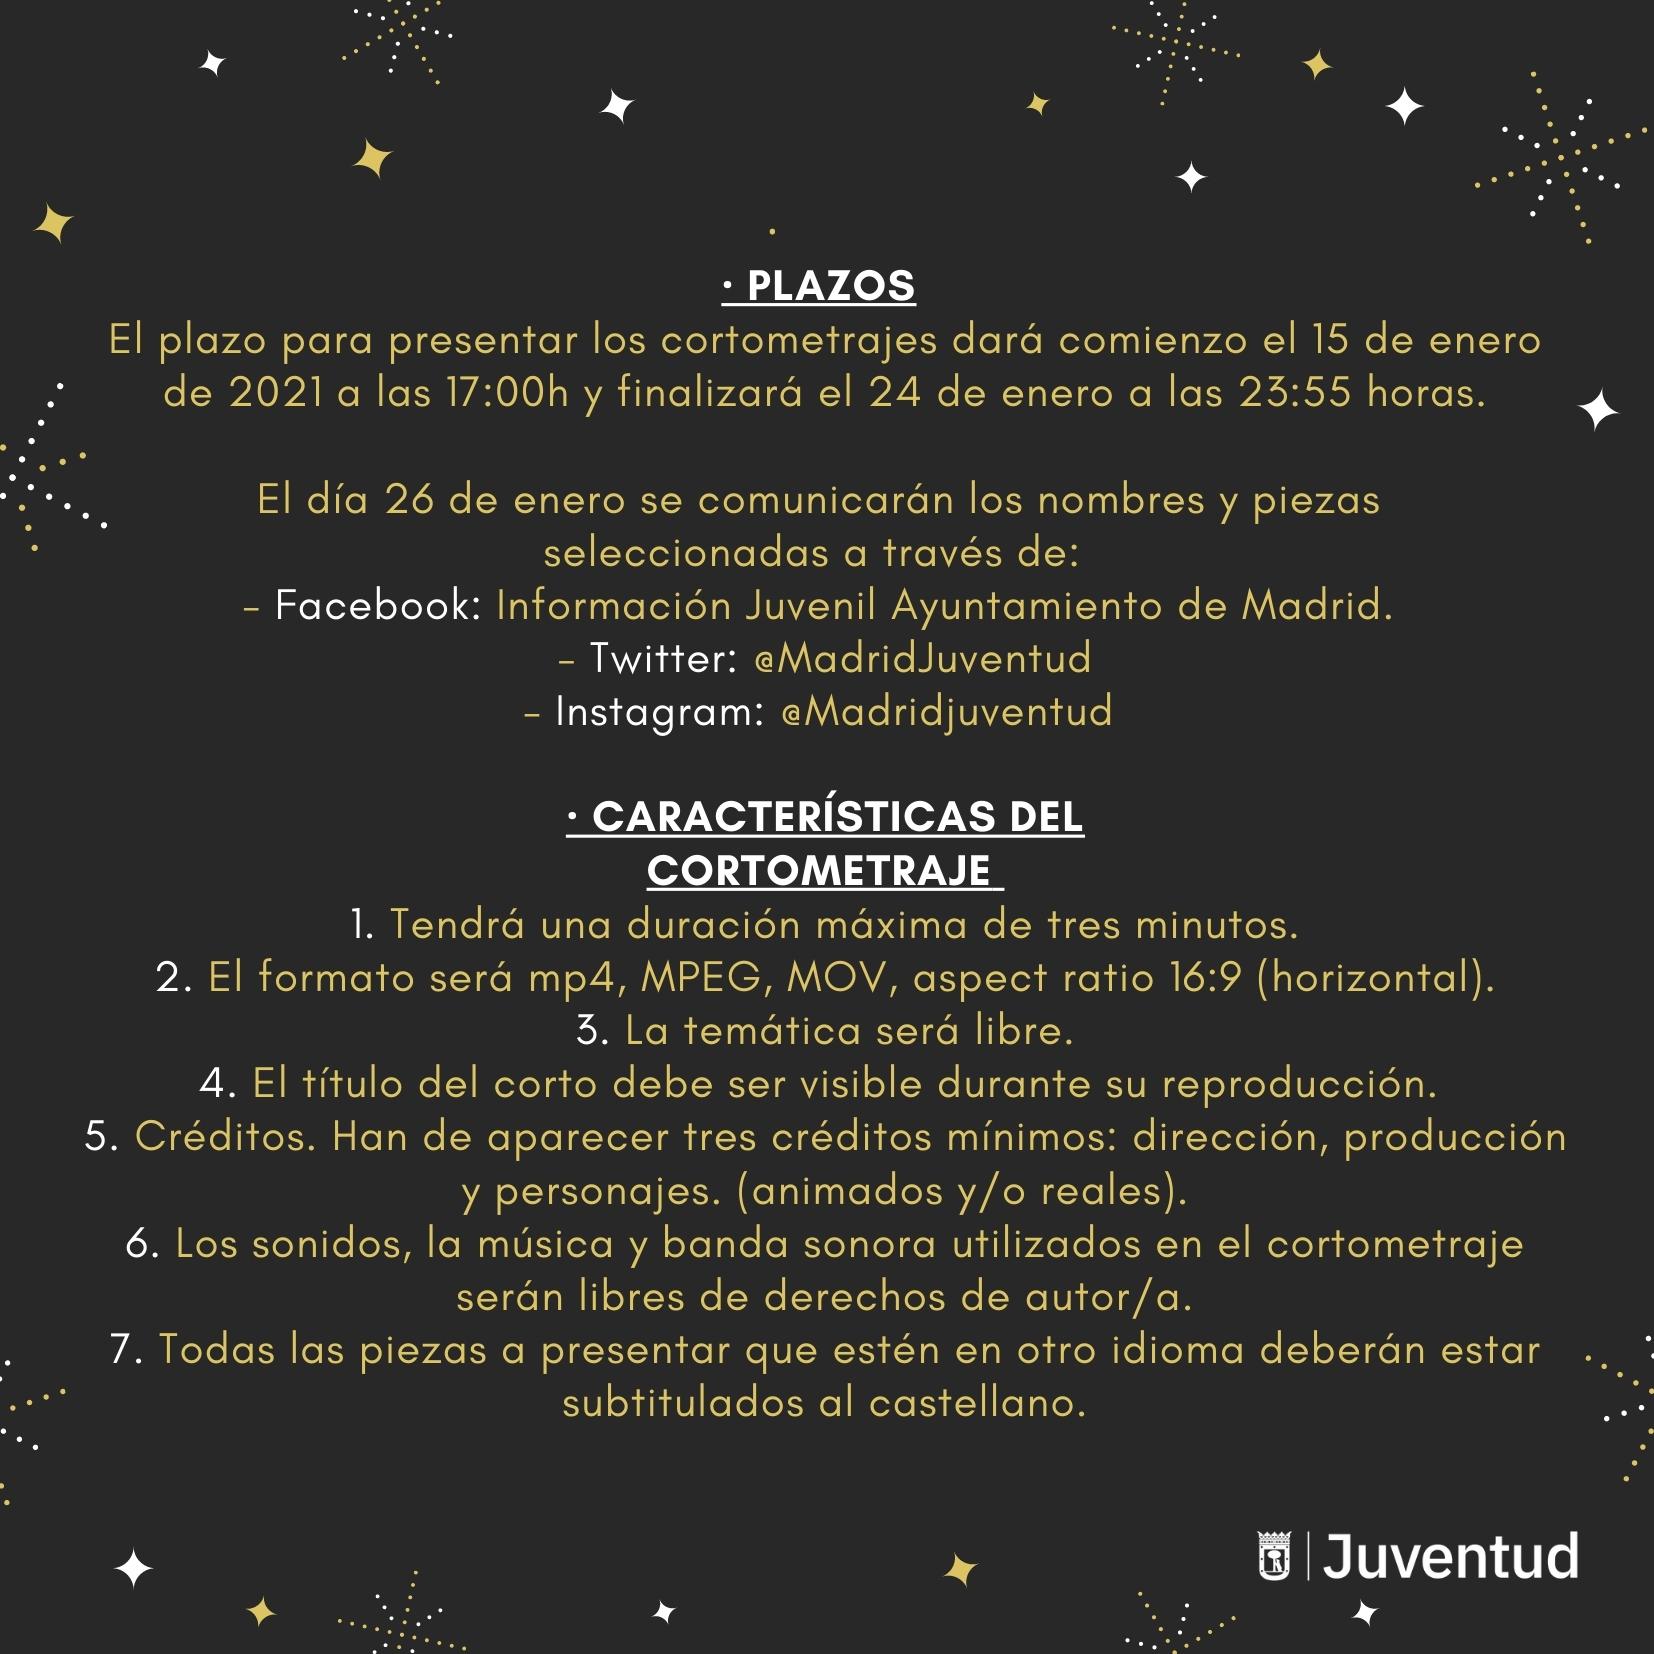 Festival de cortometrajes la noche mas corta-la-noche-mas-corta-3.jpg